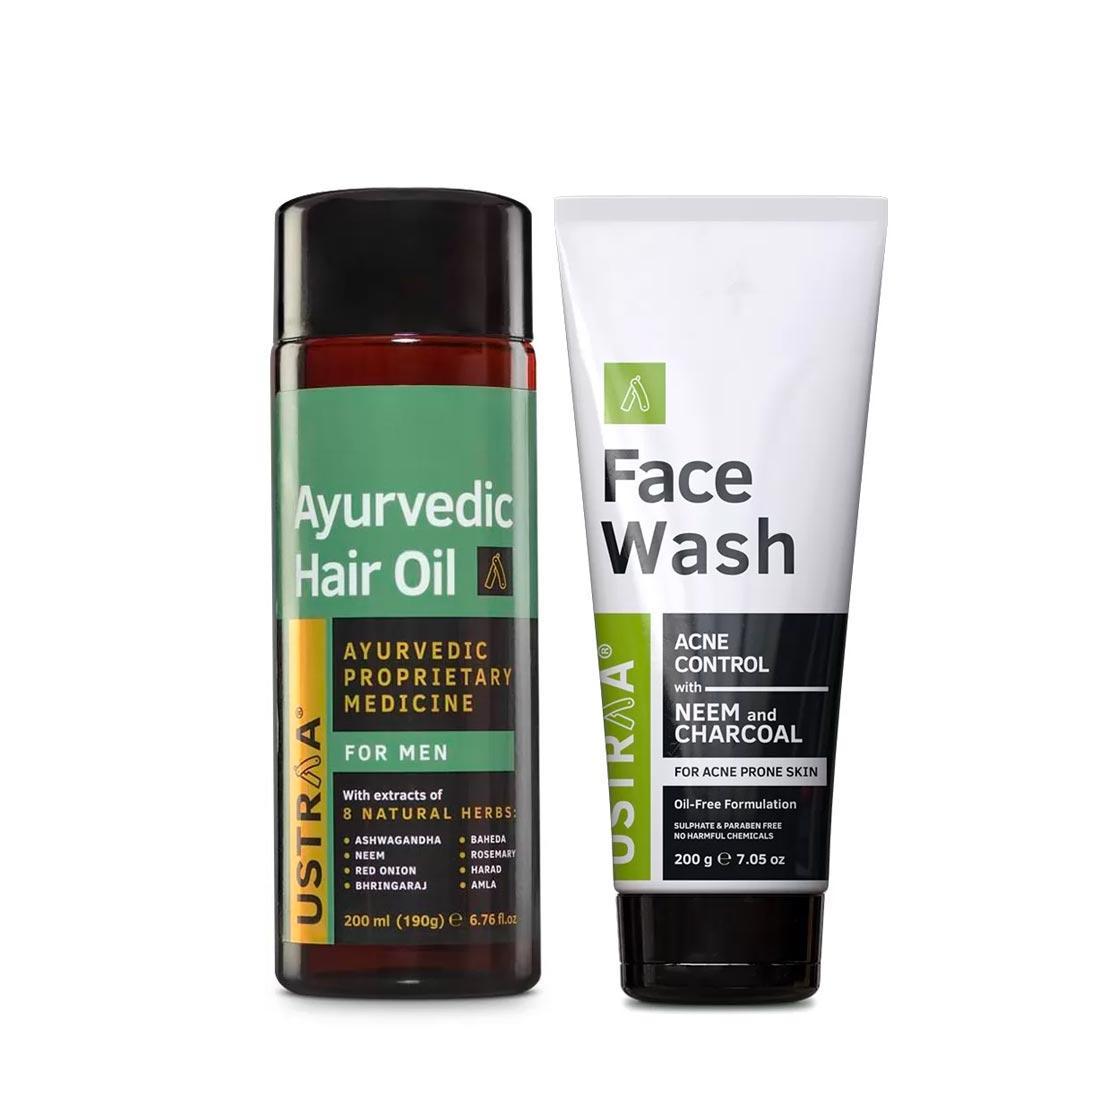 Ayurvedic Hair Oil & Face Wash Acne Control